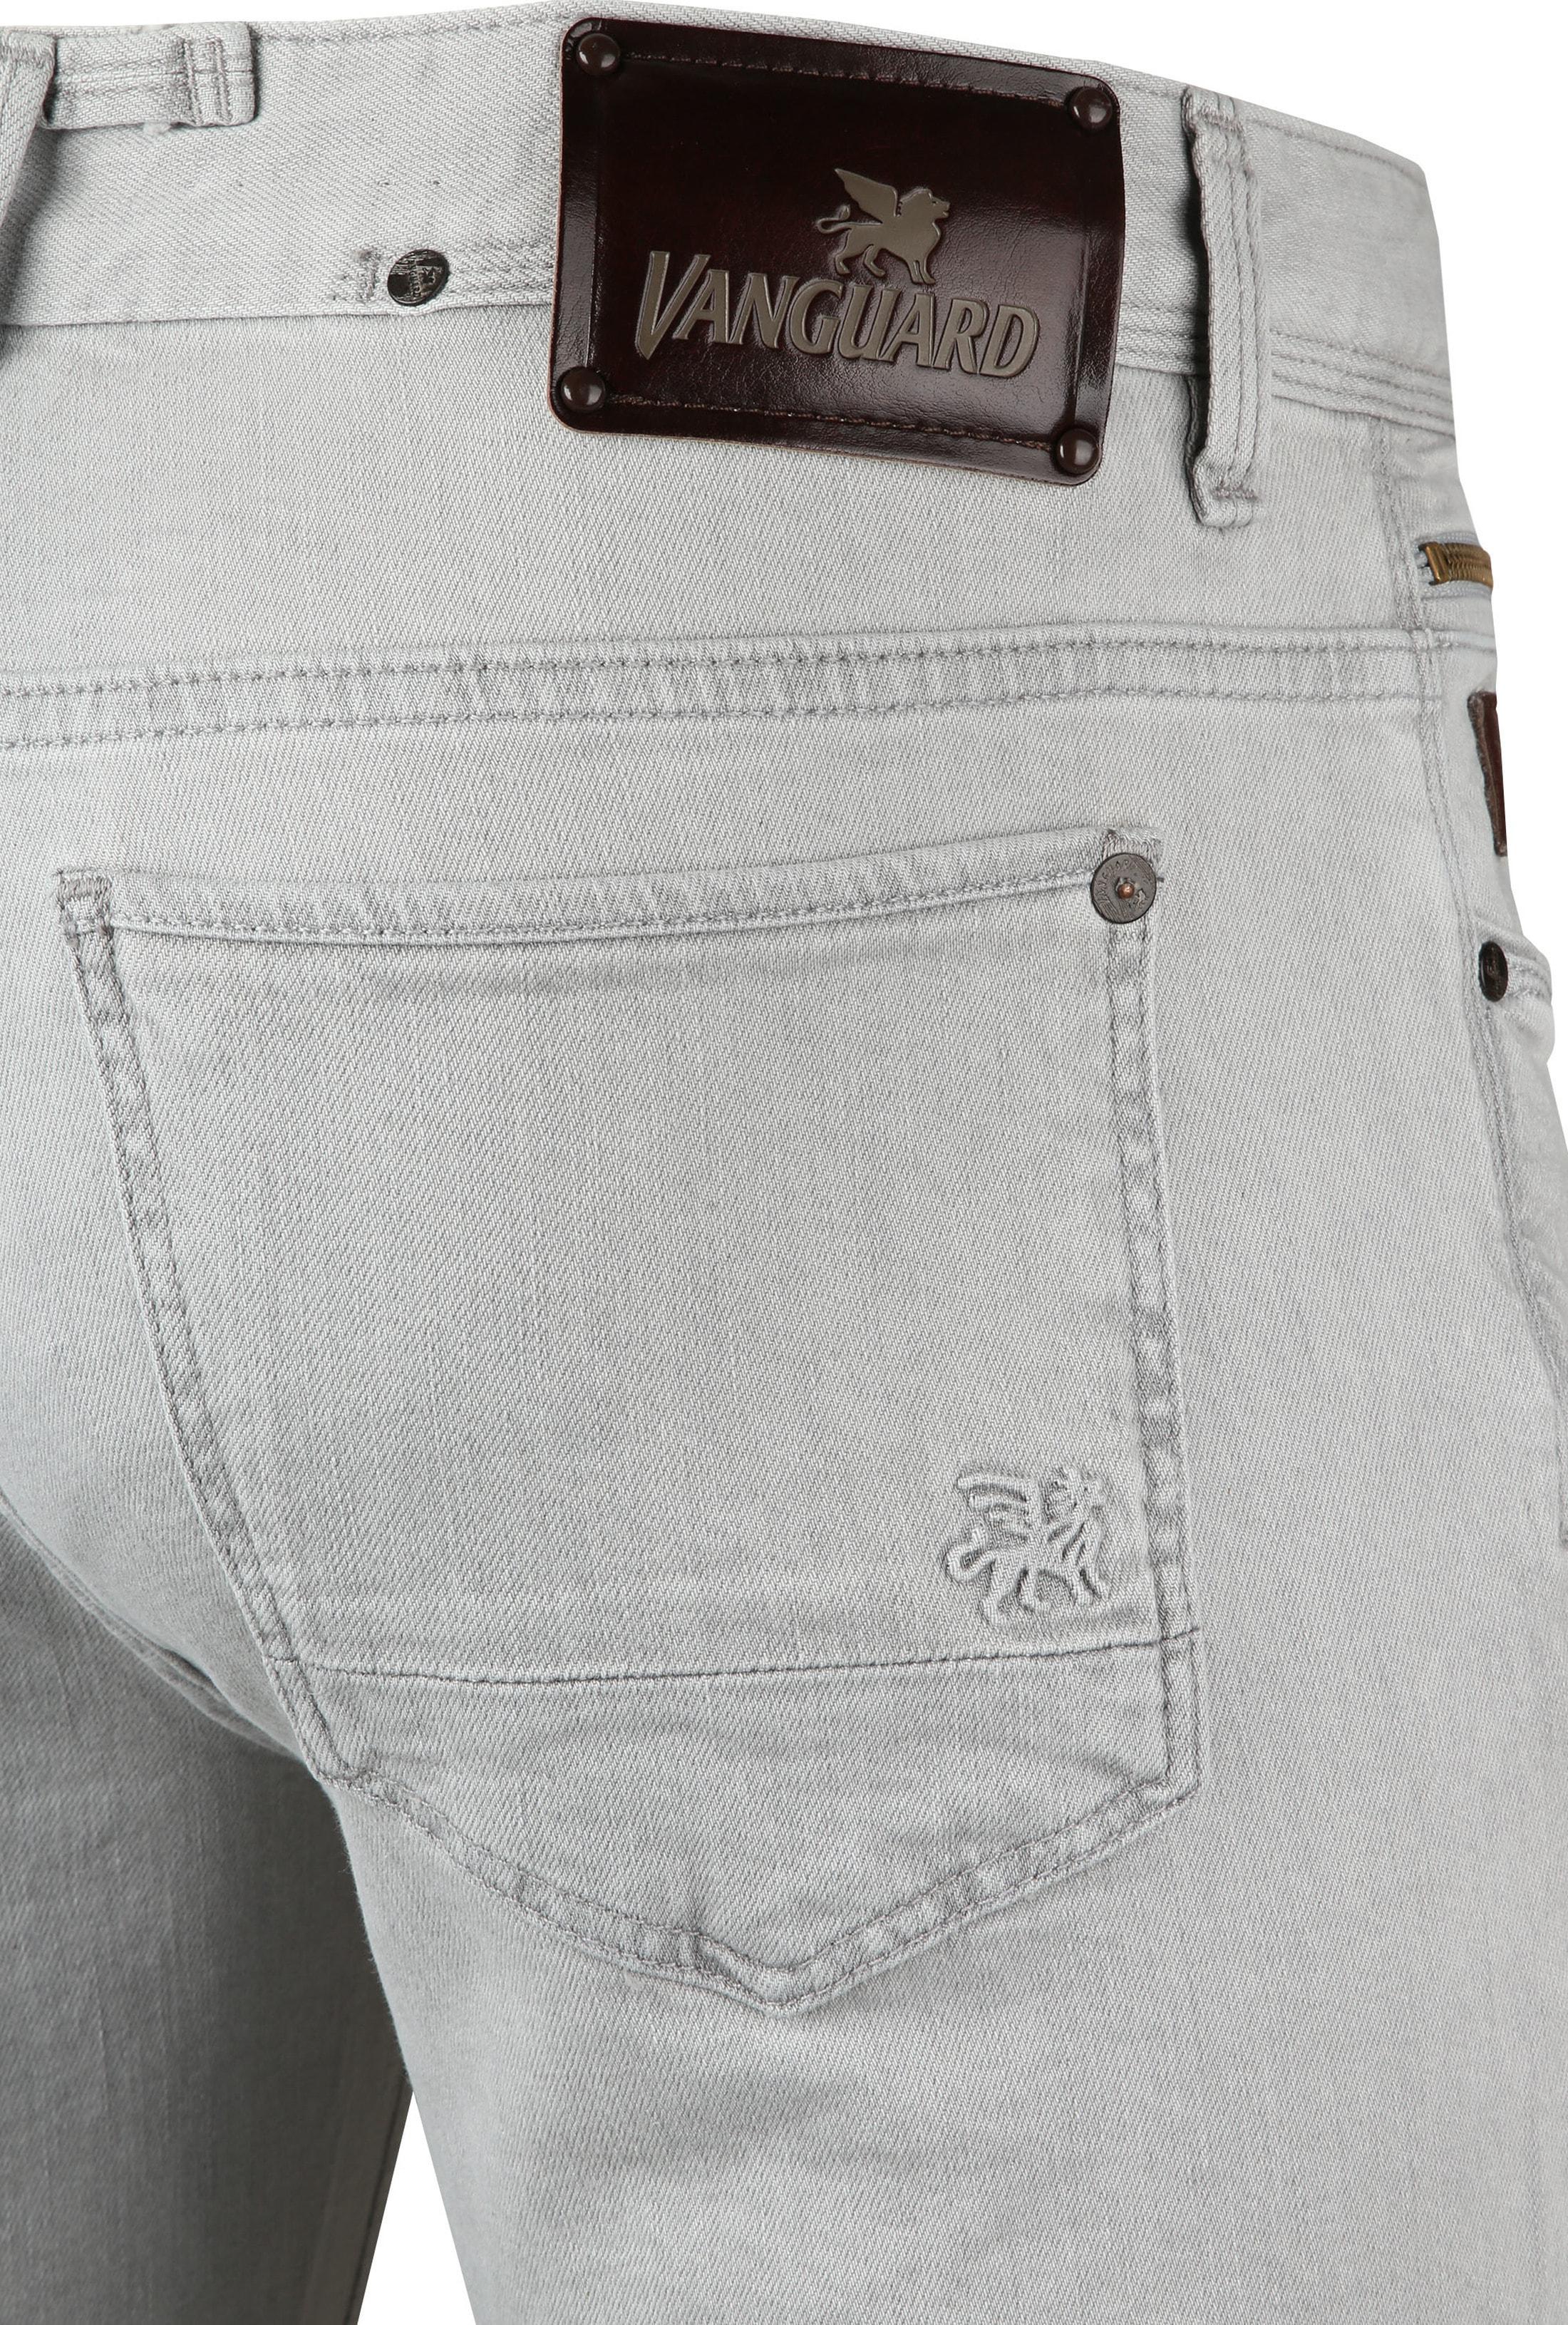 Vanguard V850 Rider Jeans Grey foto 1